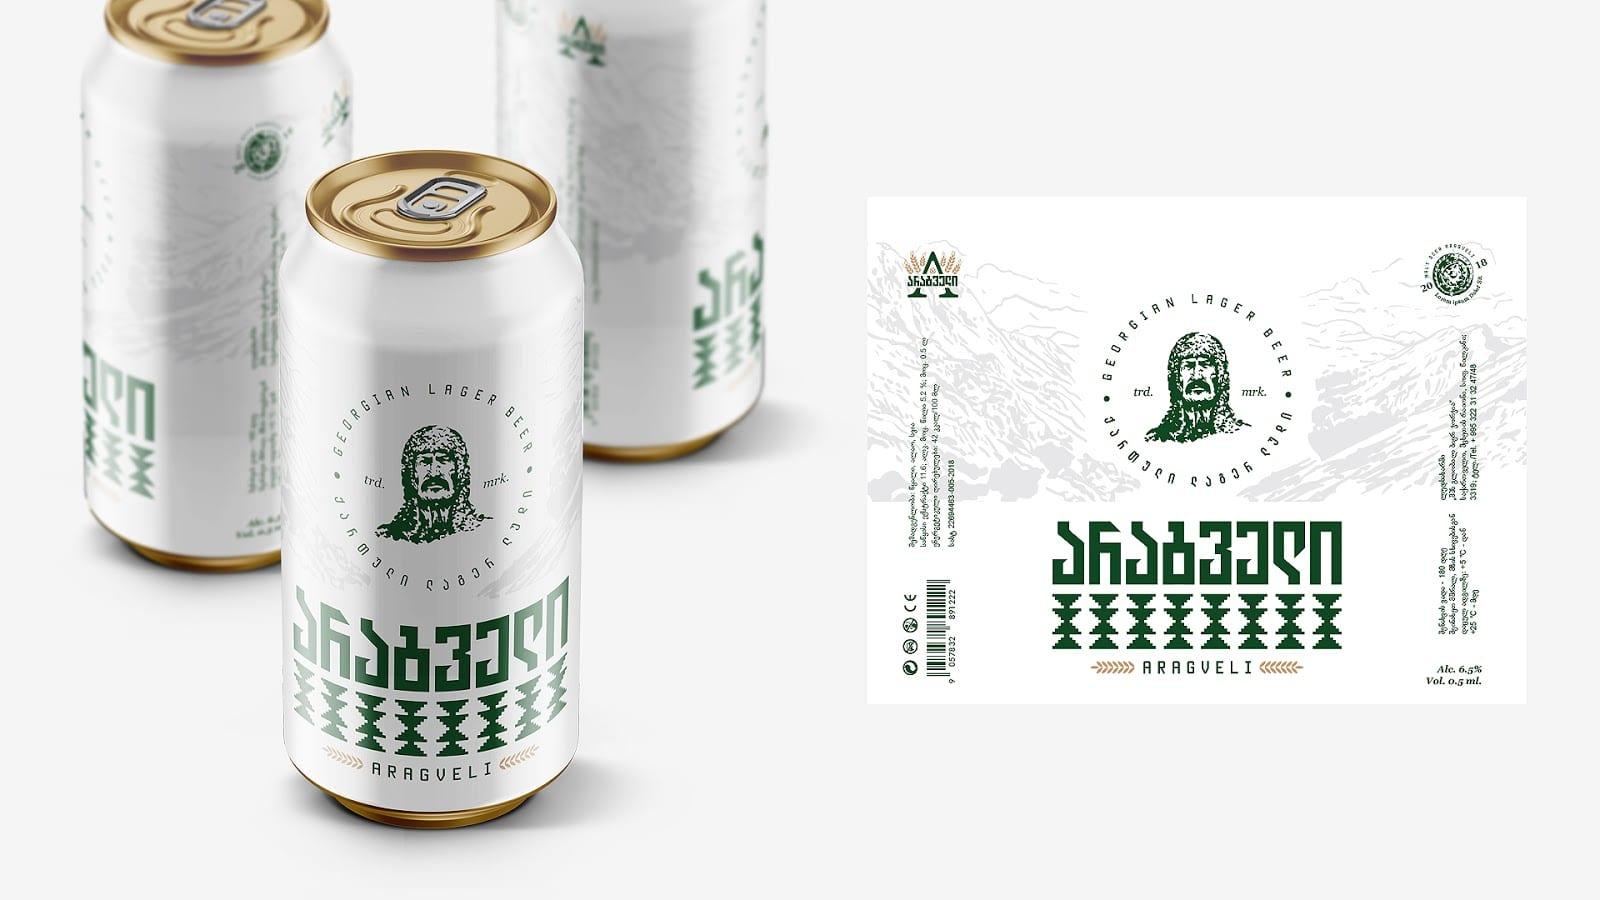 6 Simulation1 - Odvážná podoba piva Aragveli